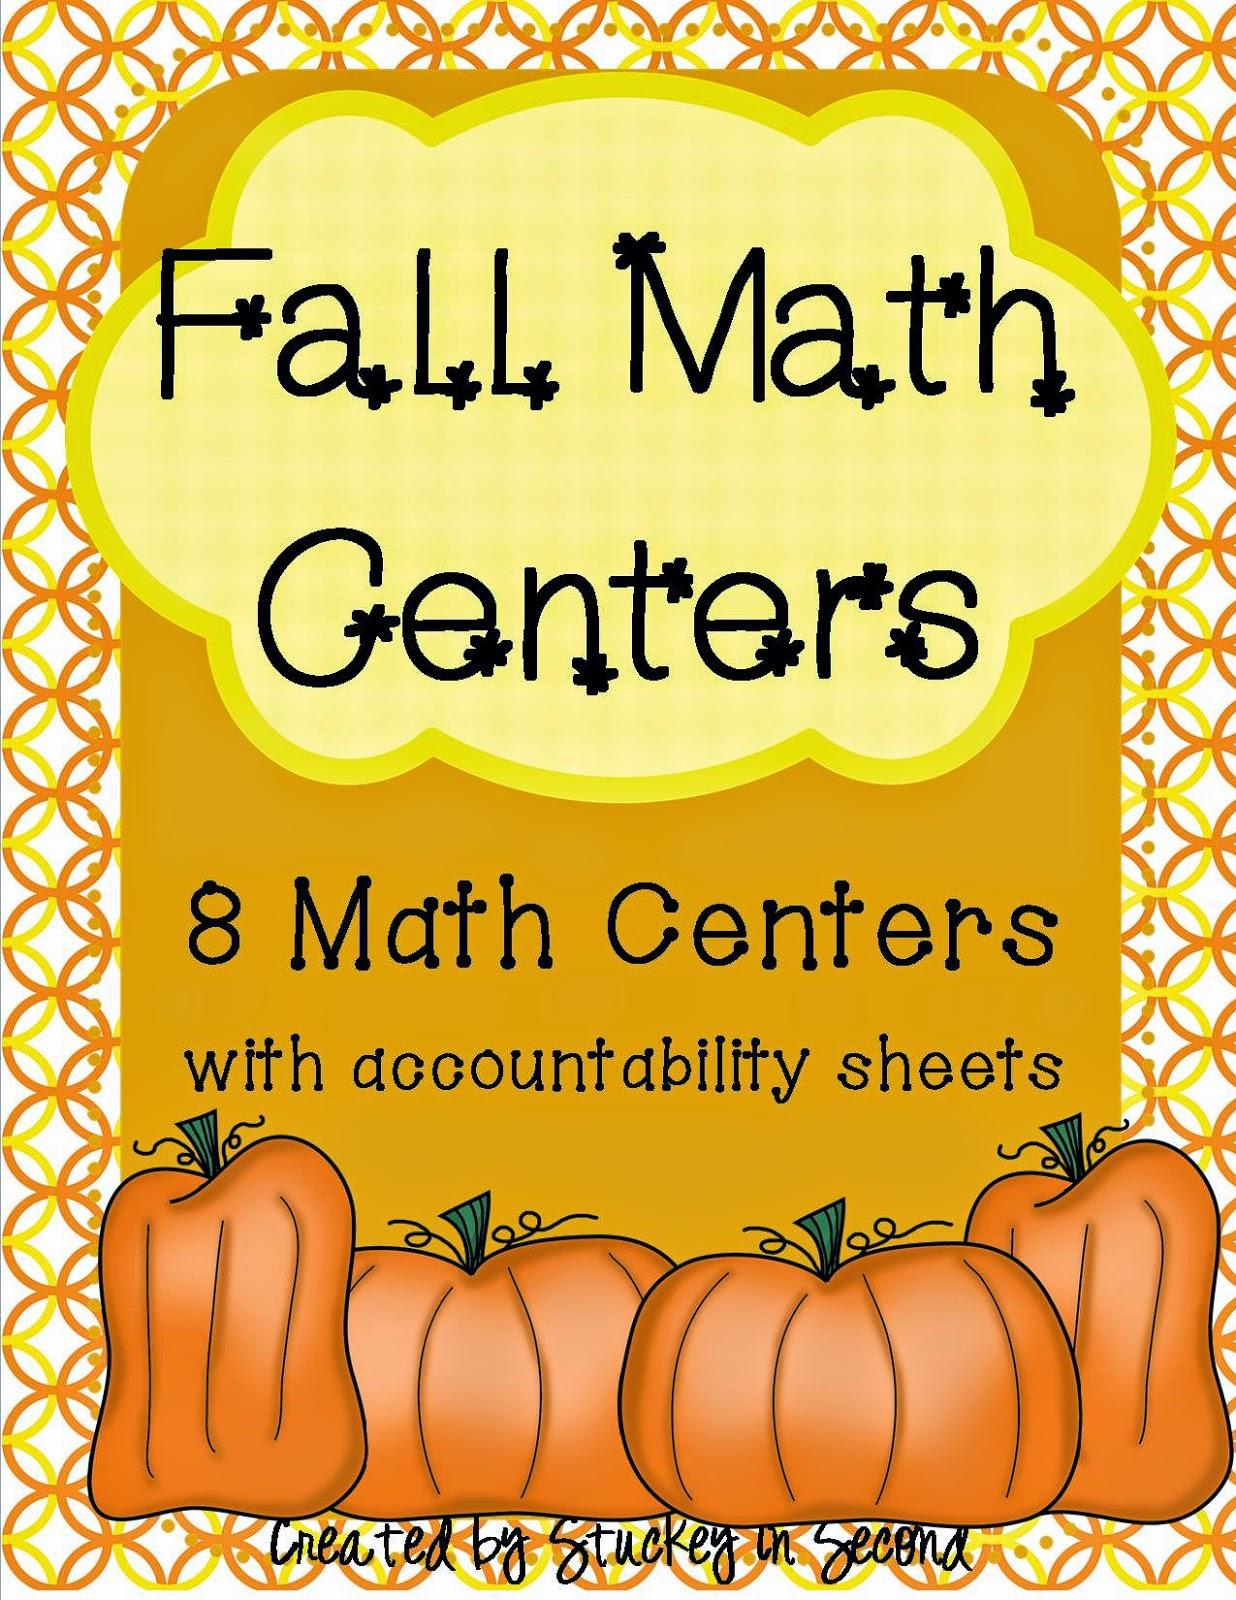 http://www.teacherspayteachers.com/Product/Fall-Math-Centers-mClass-Envision-based-8-Centers-Total-922714